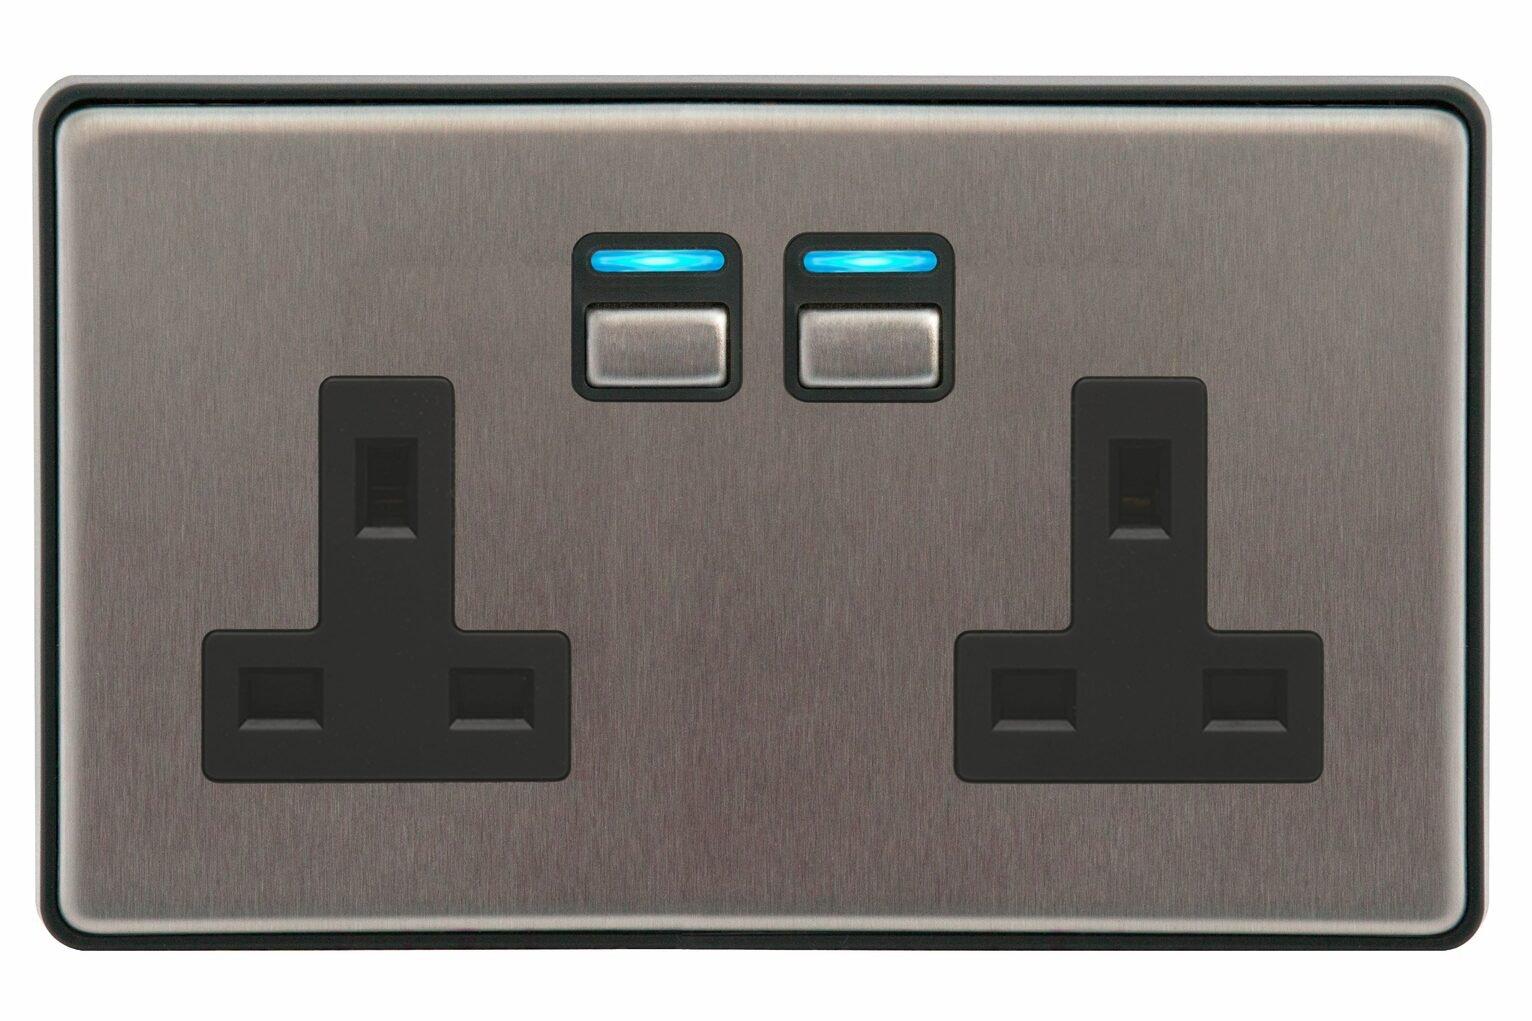 Lightwave Smart Series Socket -2 Gang- Stainless Steel